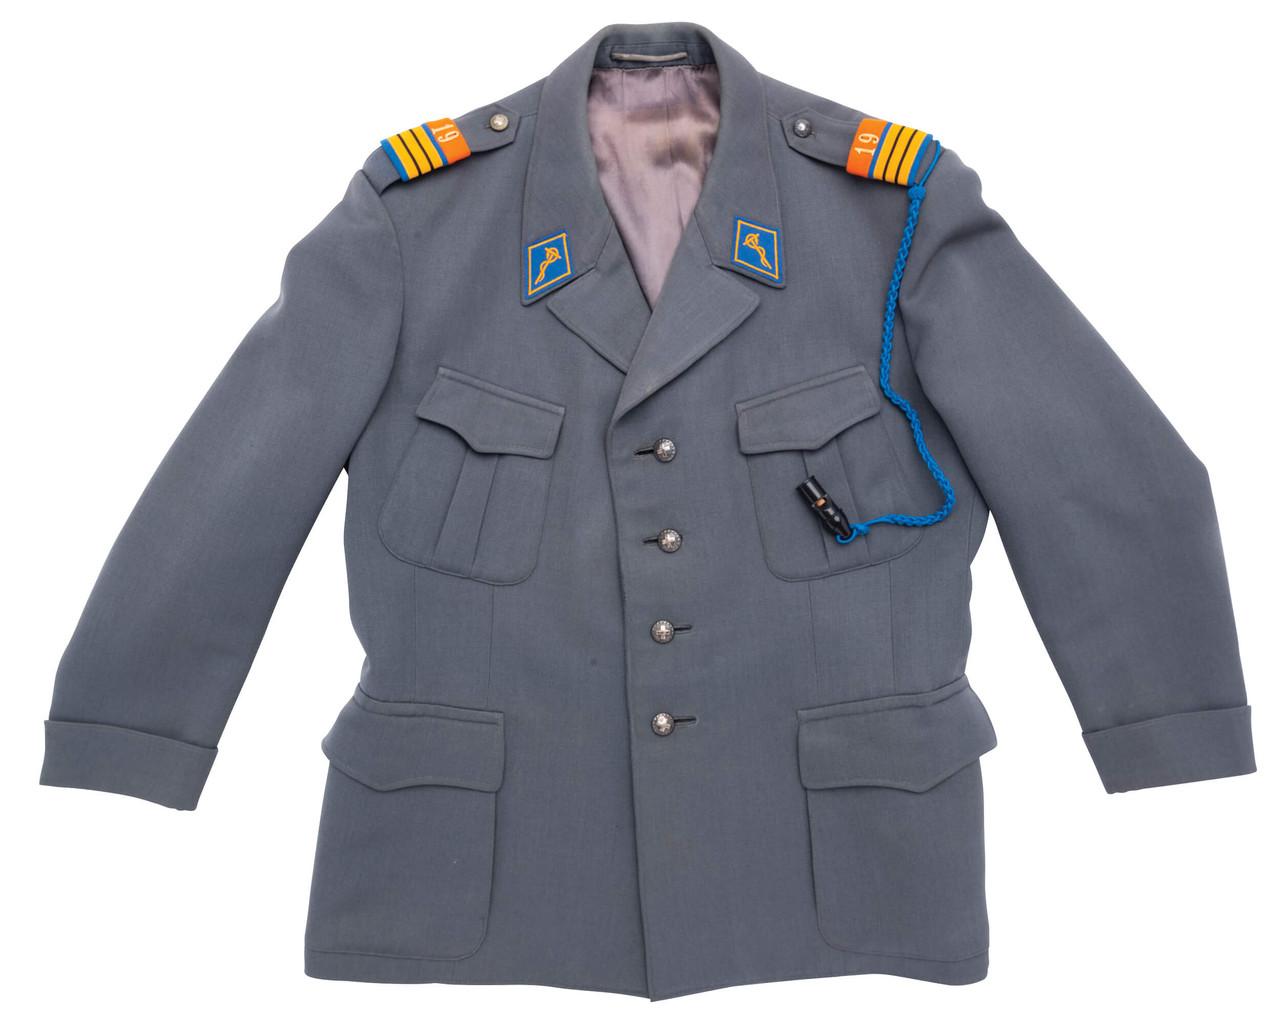 Swiss Army Colonel Uniform - Medic